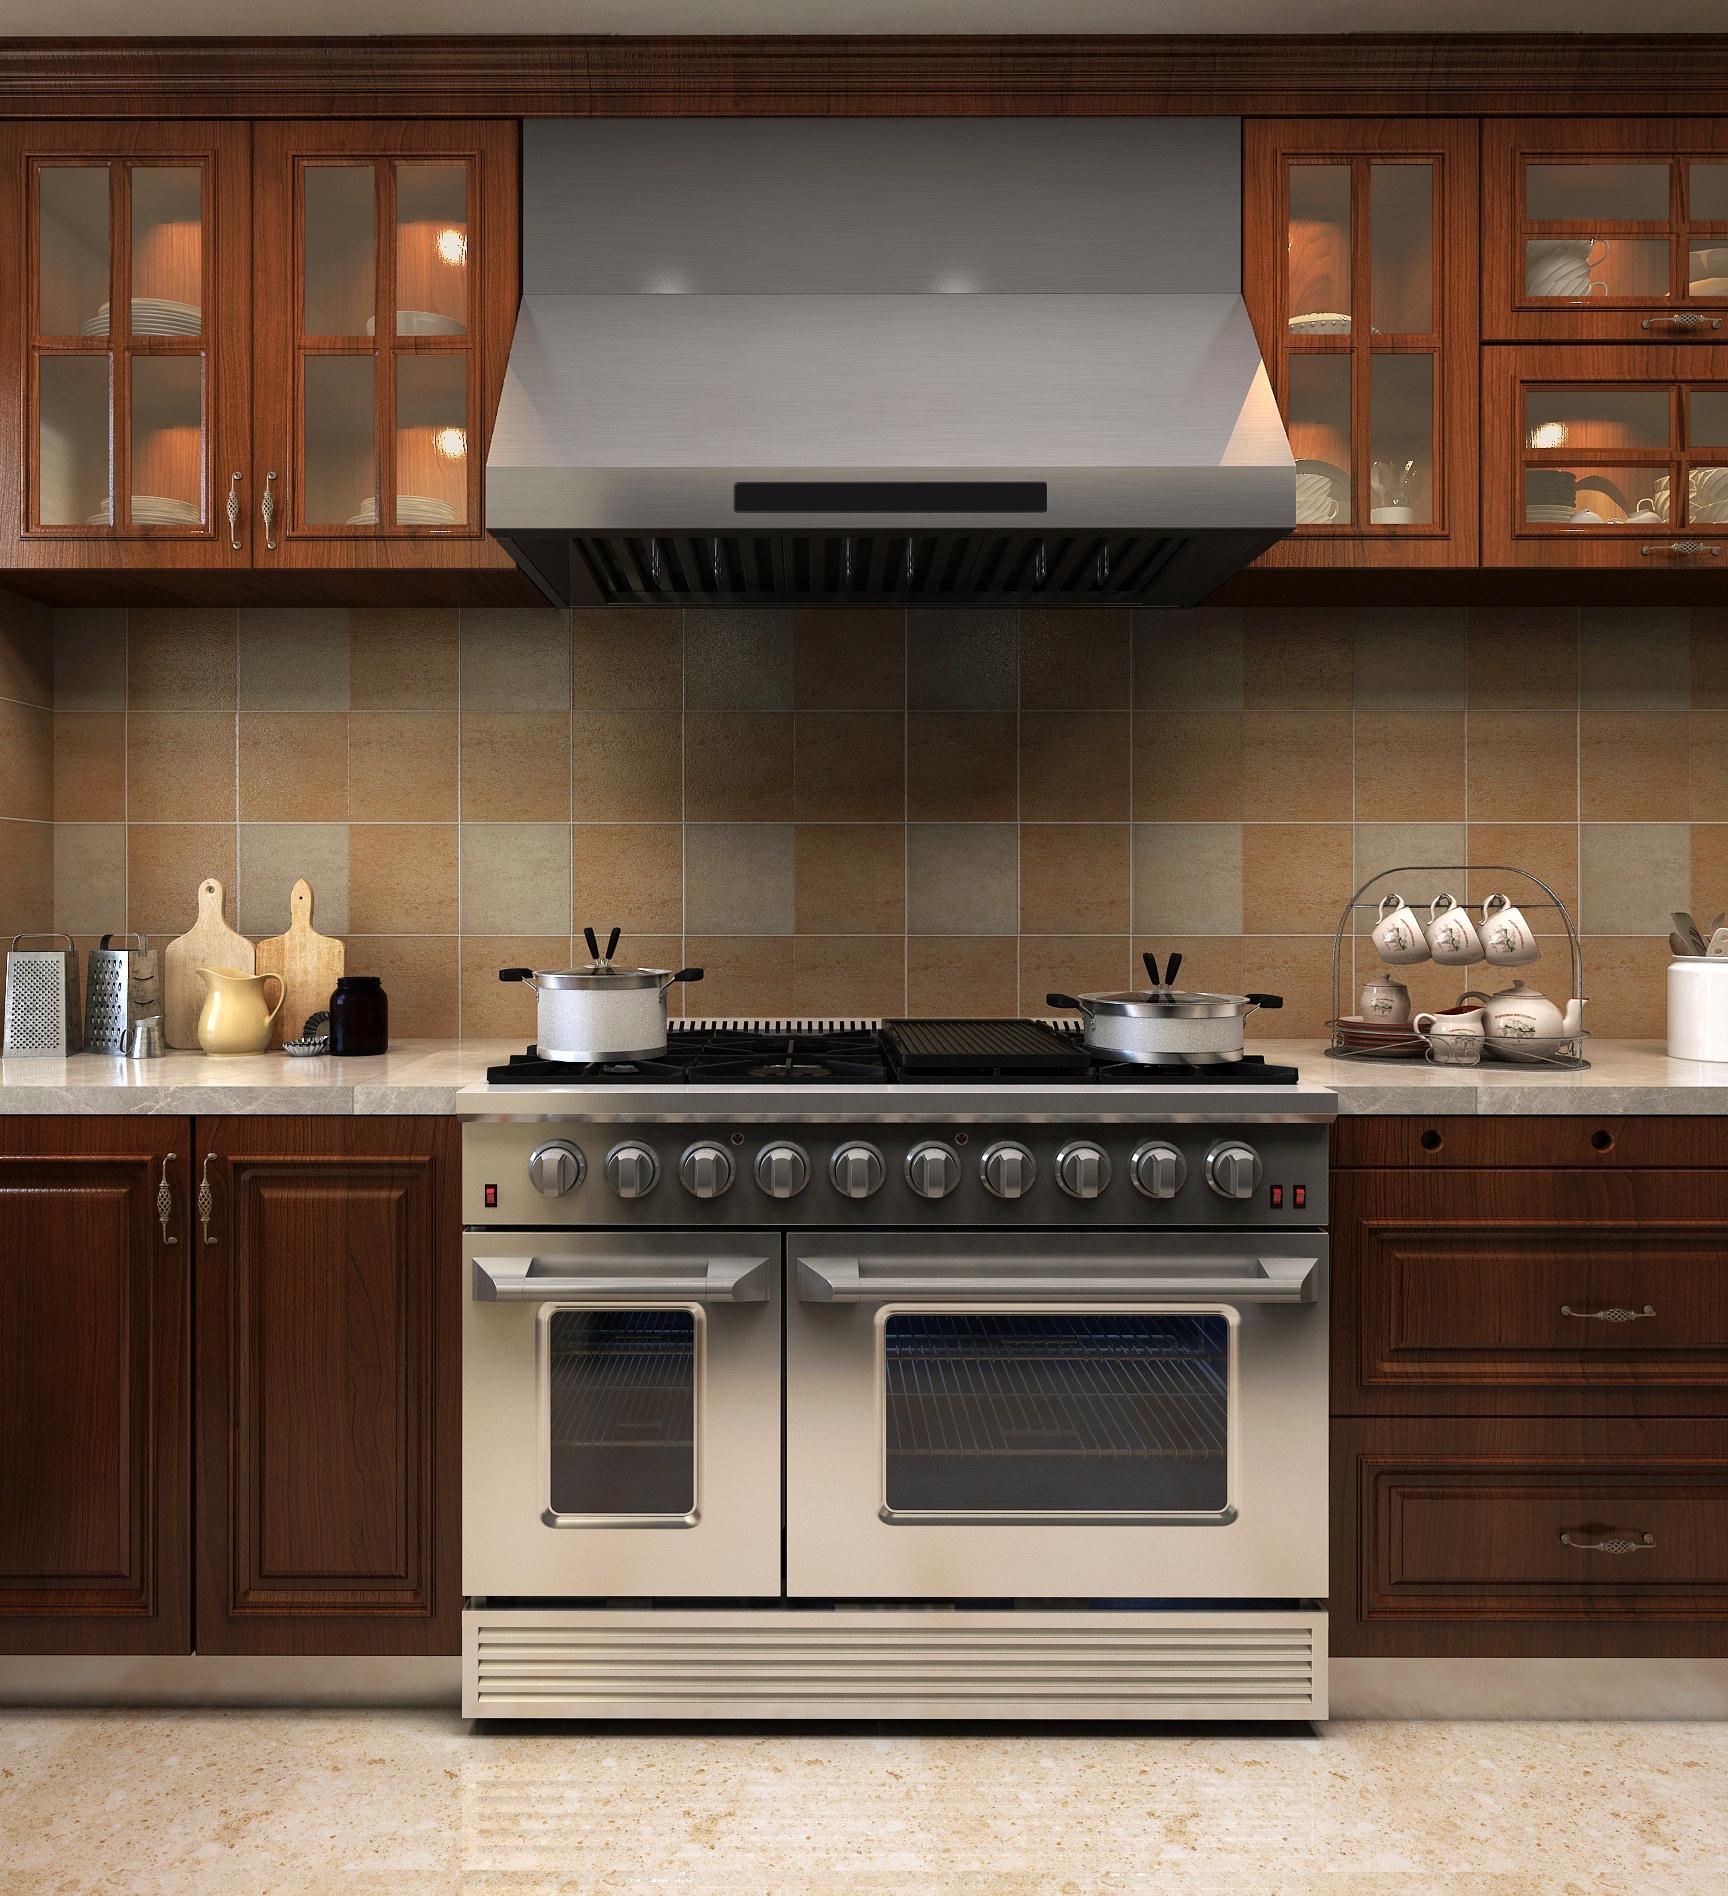 SENG CSA certified kitchen stainless steel 48